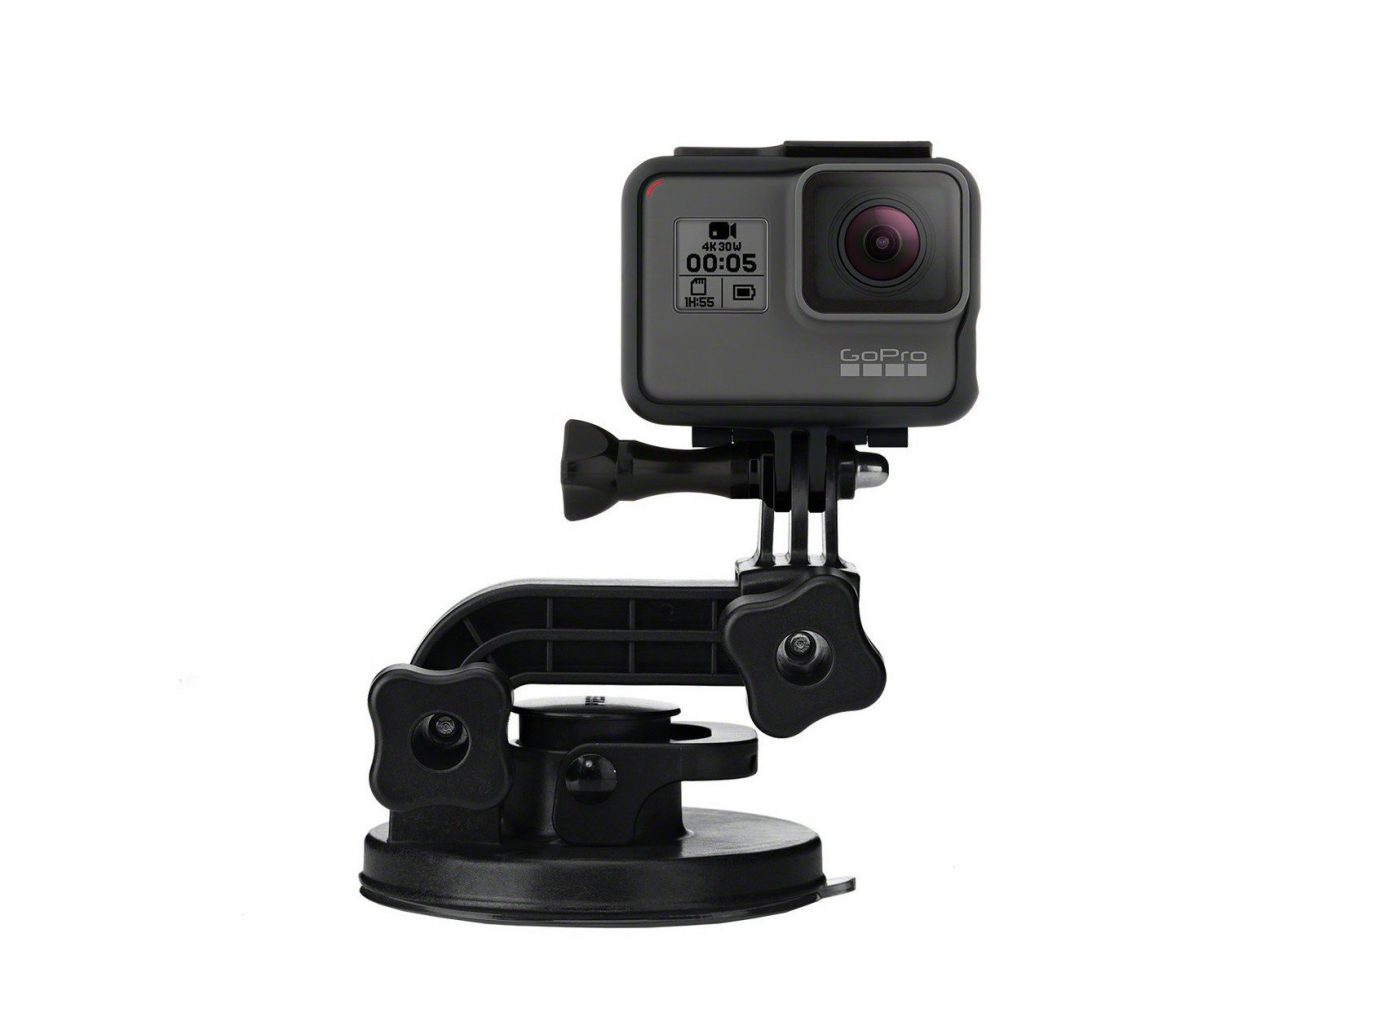 Solo Travel Travel Shop Travel Tech Travel Tips cameras & optics camera camera accessory product camera lens multimedia projector light